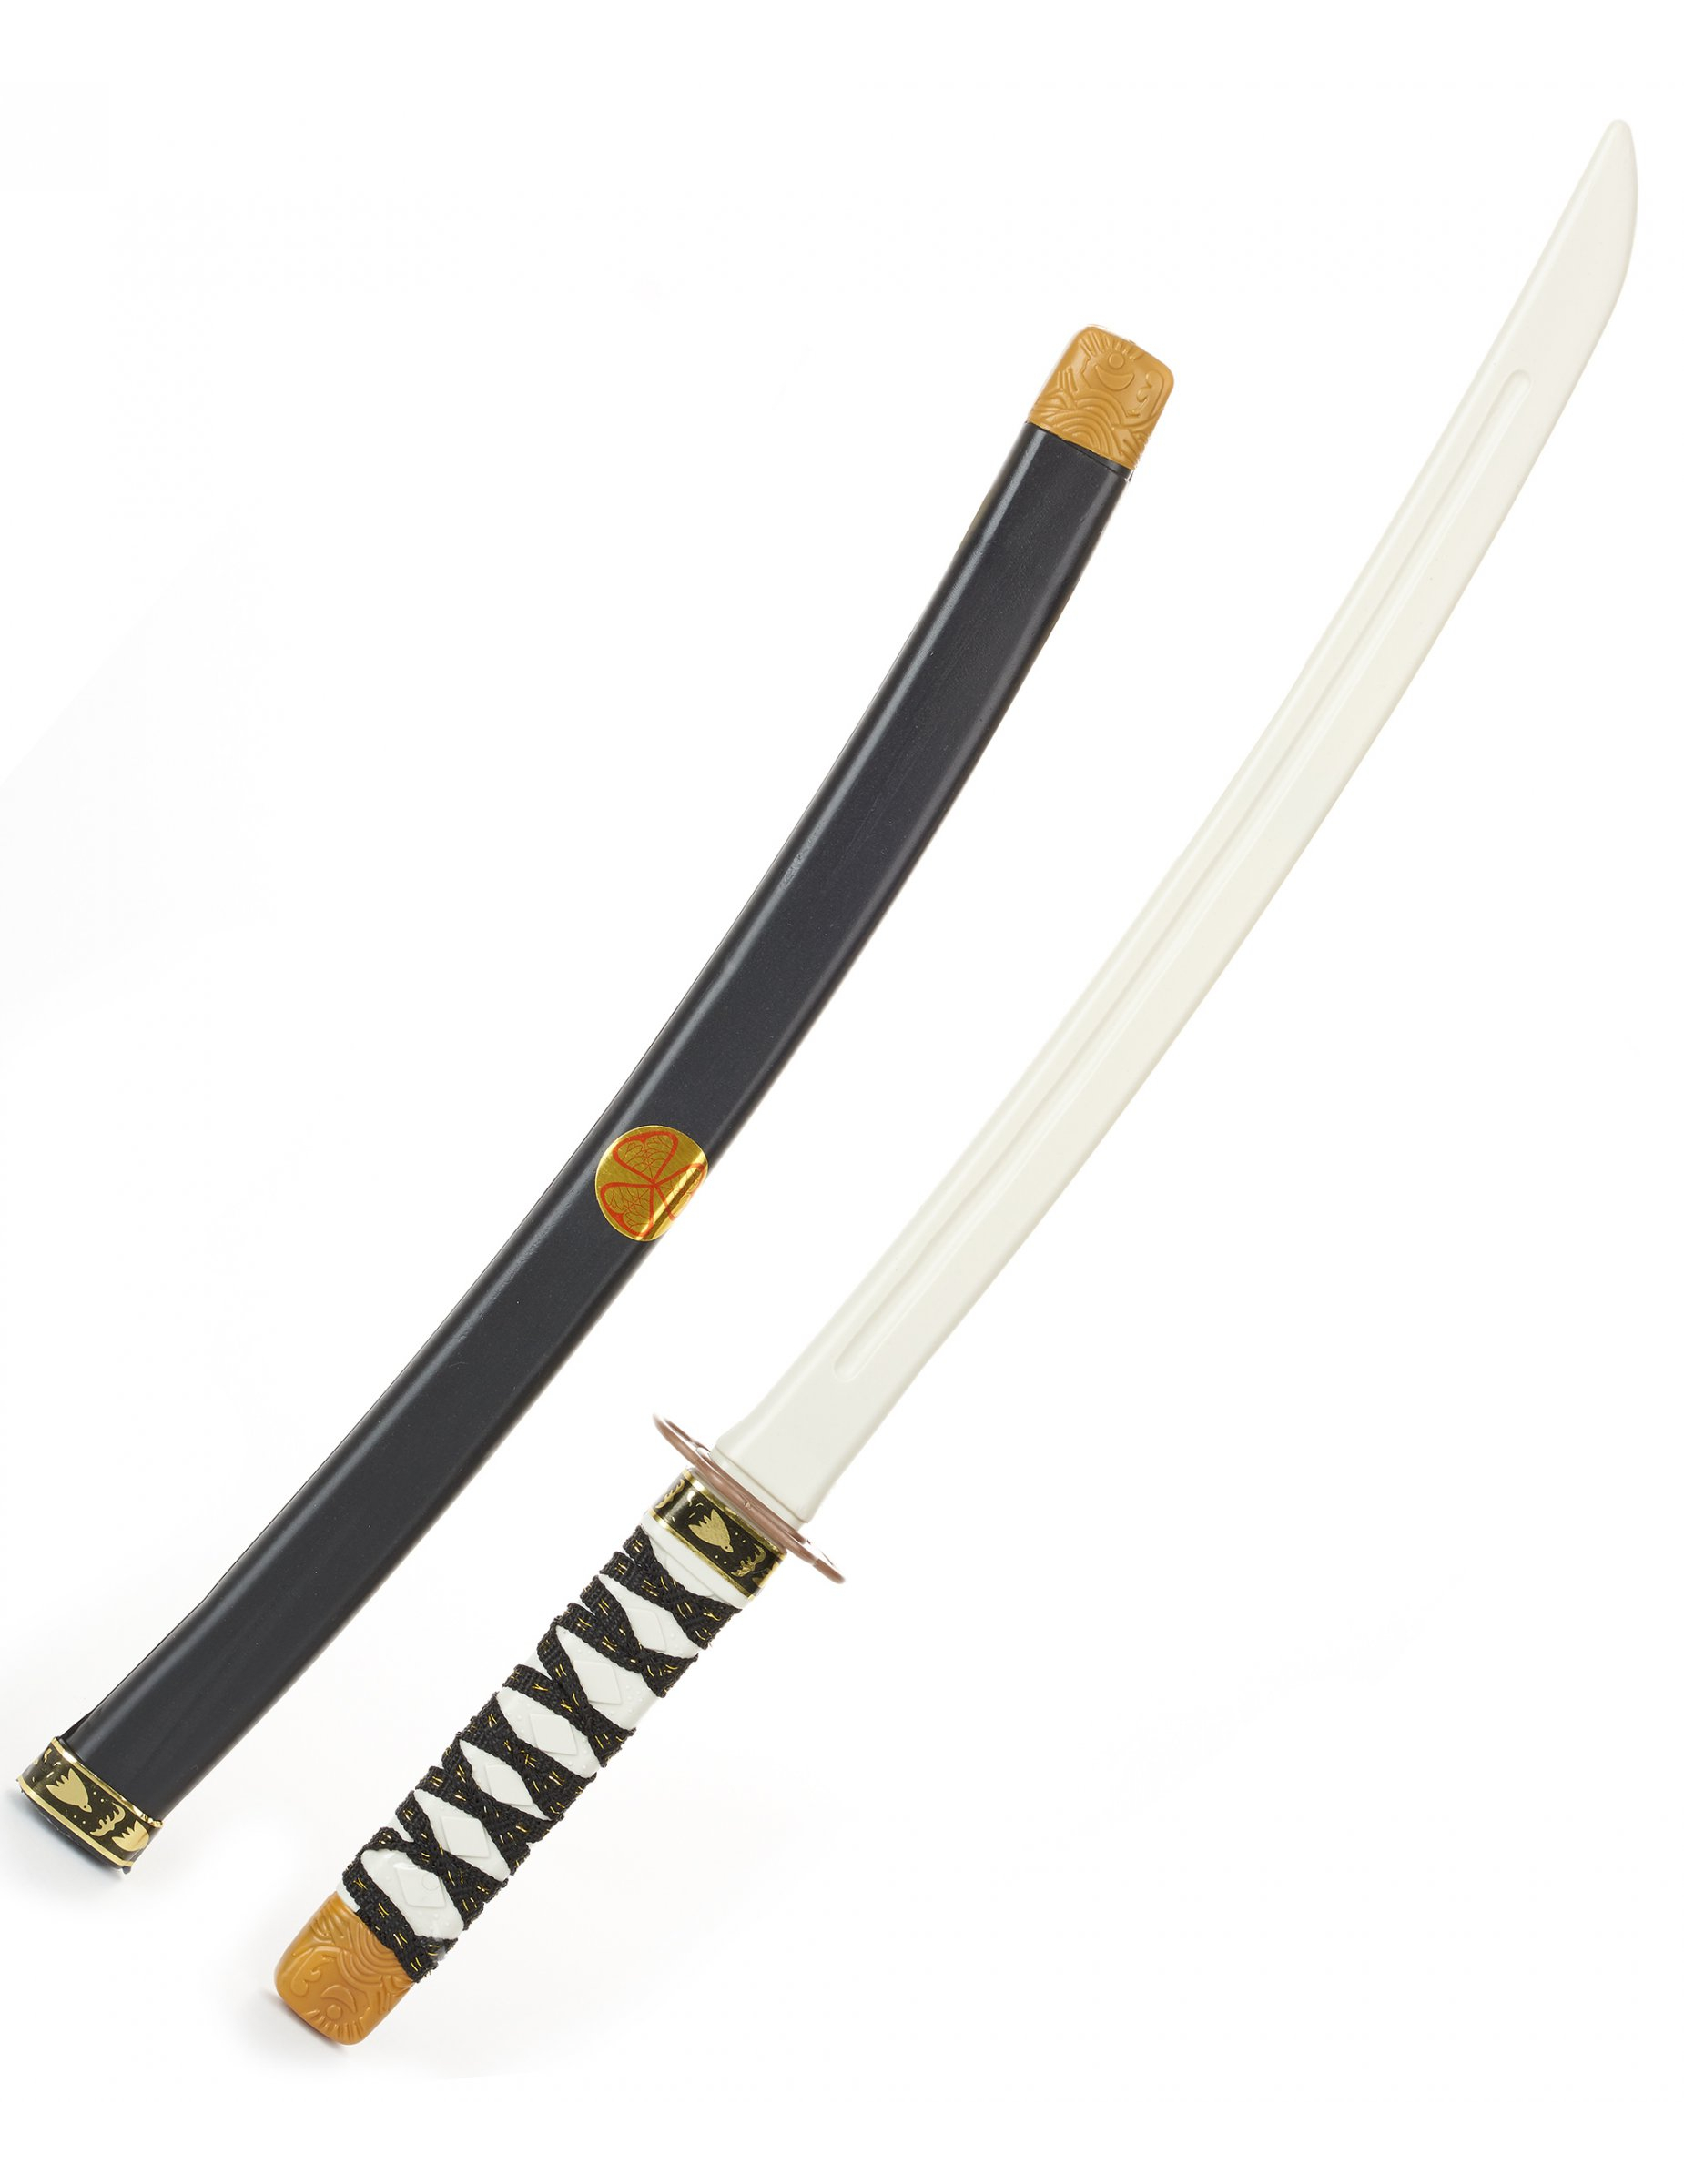 Ninja Schwert Fur Kinder Sabel Grau Schwarz 60cm Gunstige